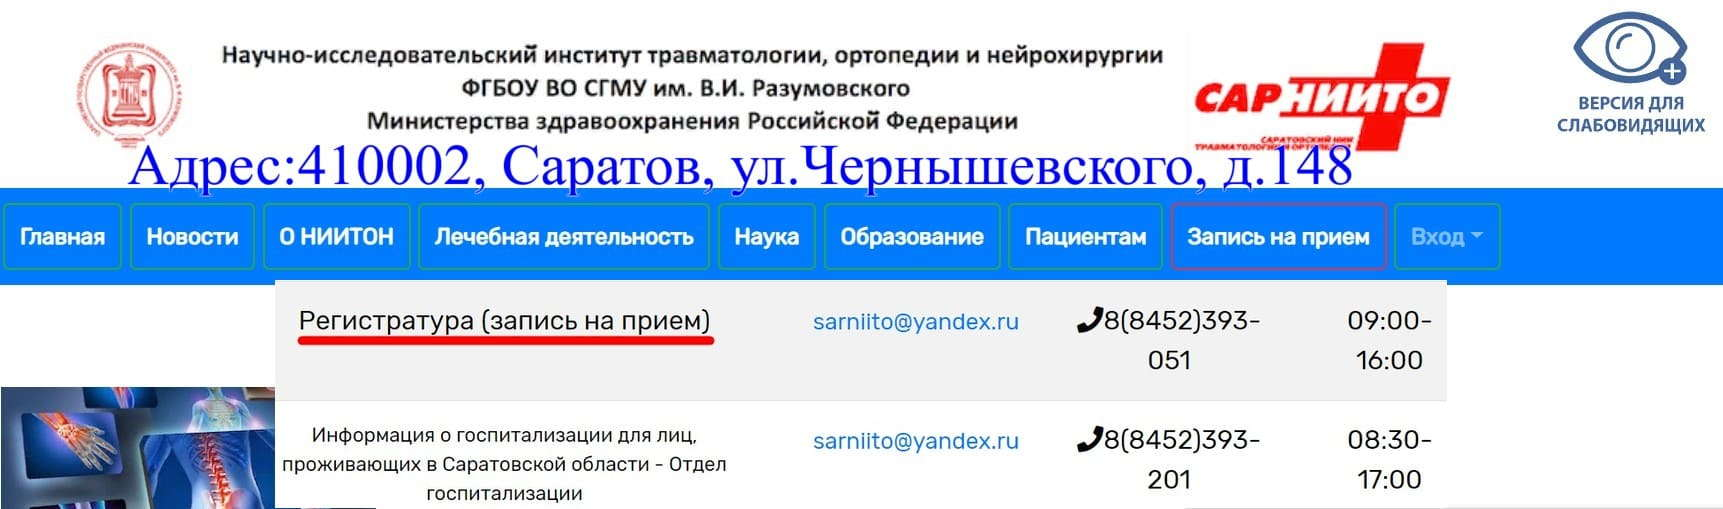 Sarniito.com запись